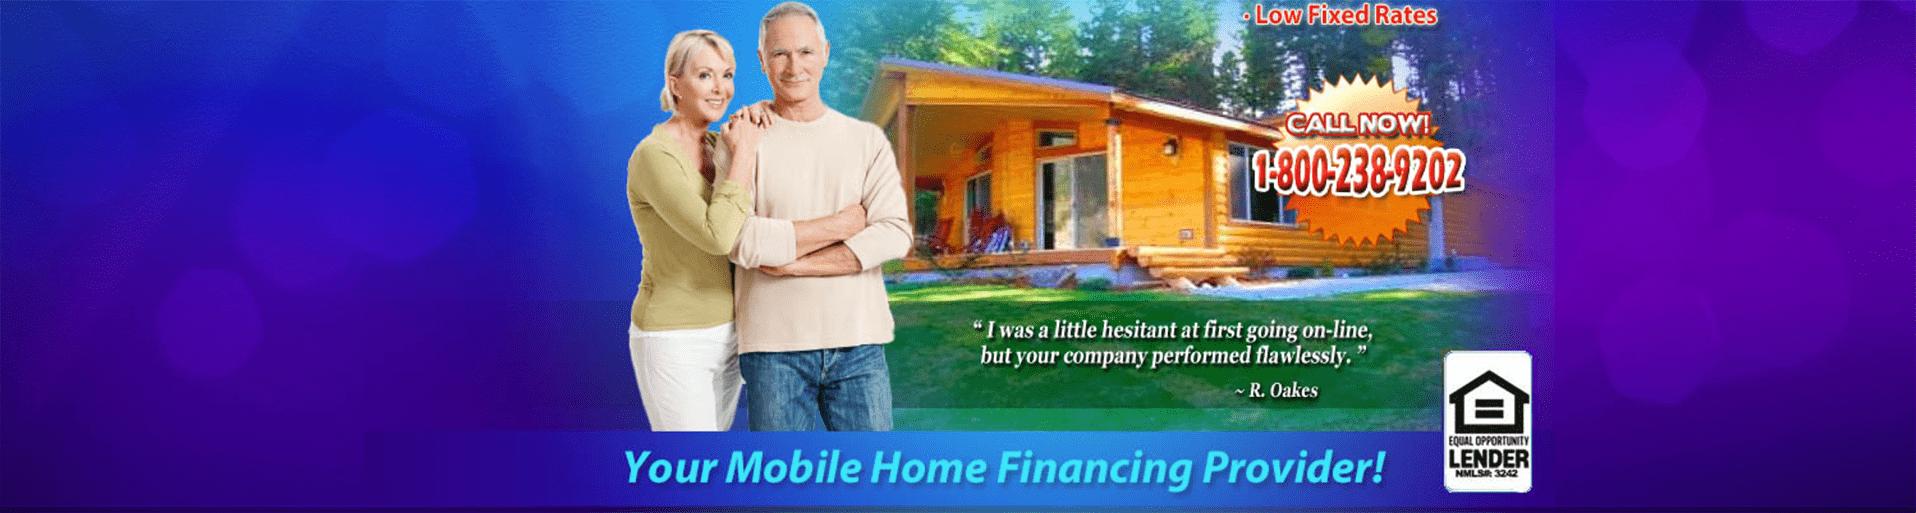 mobile home loan calculator loan interest financing rates